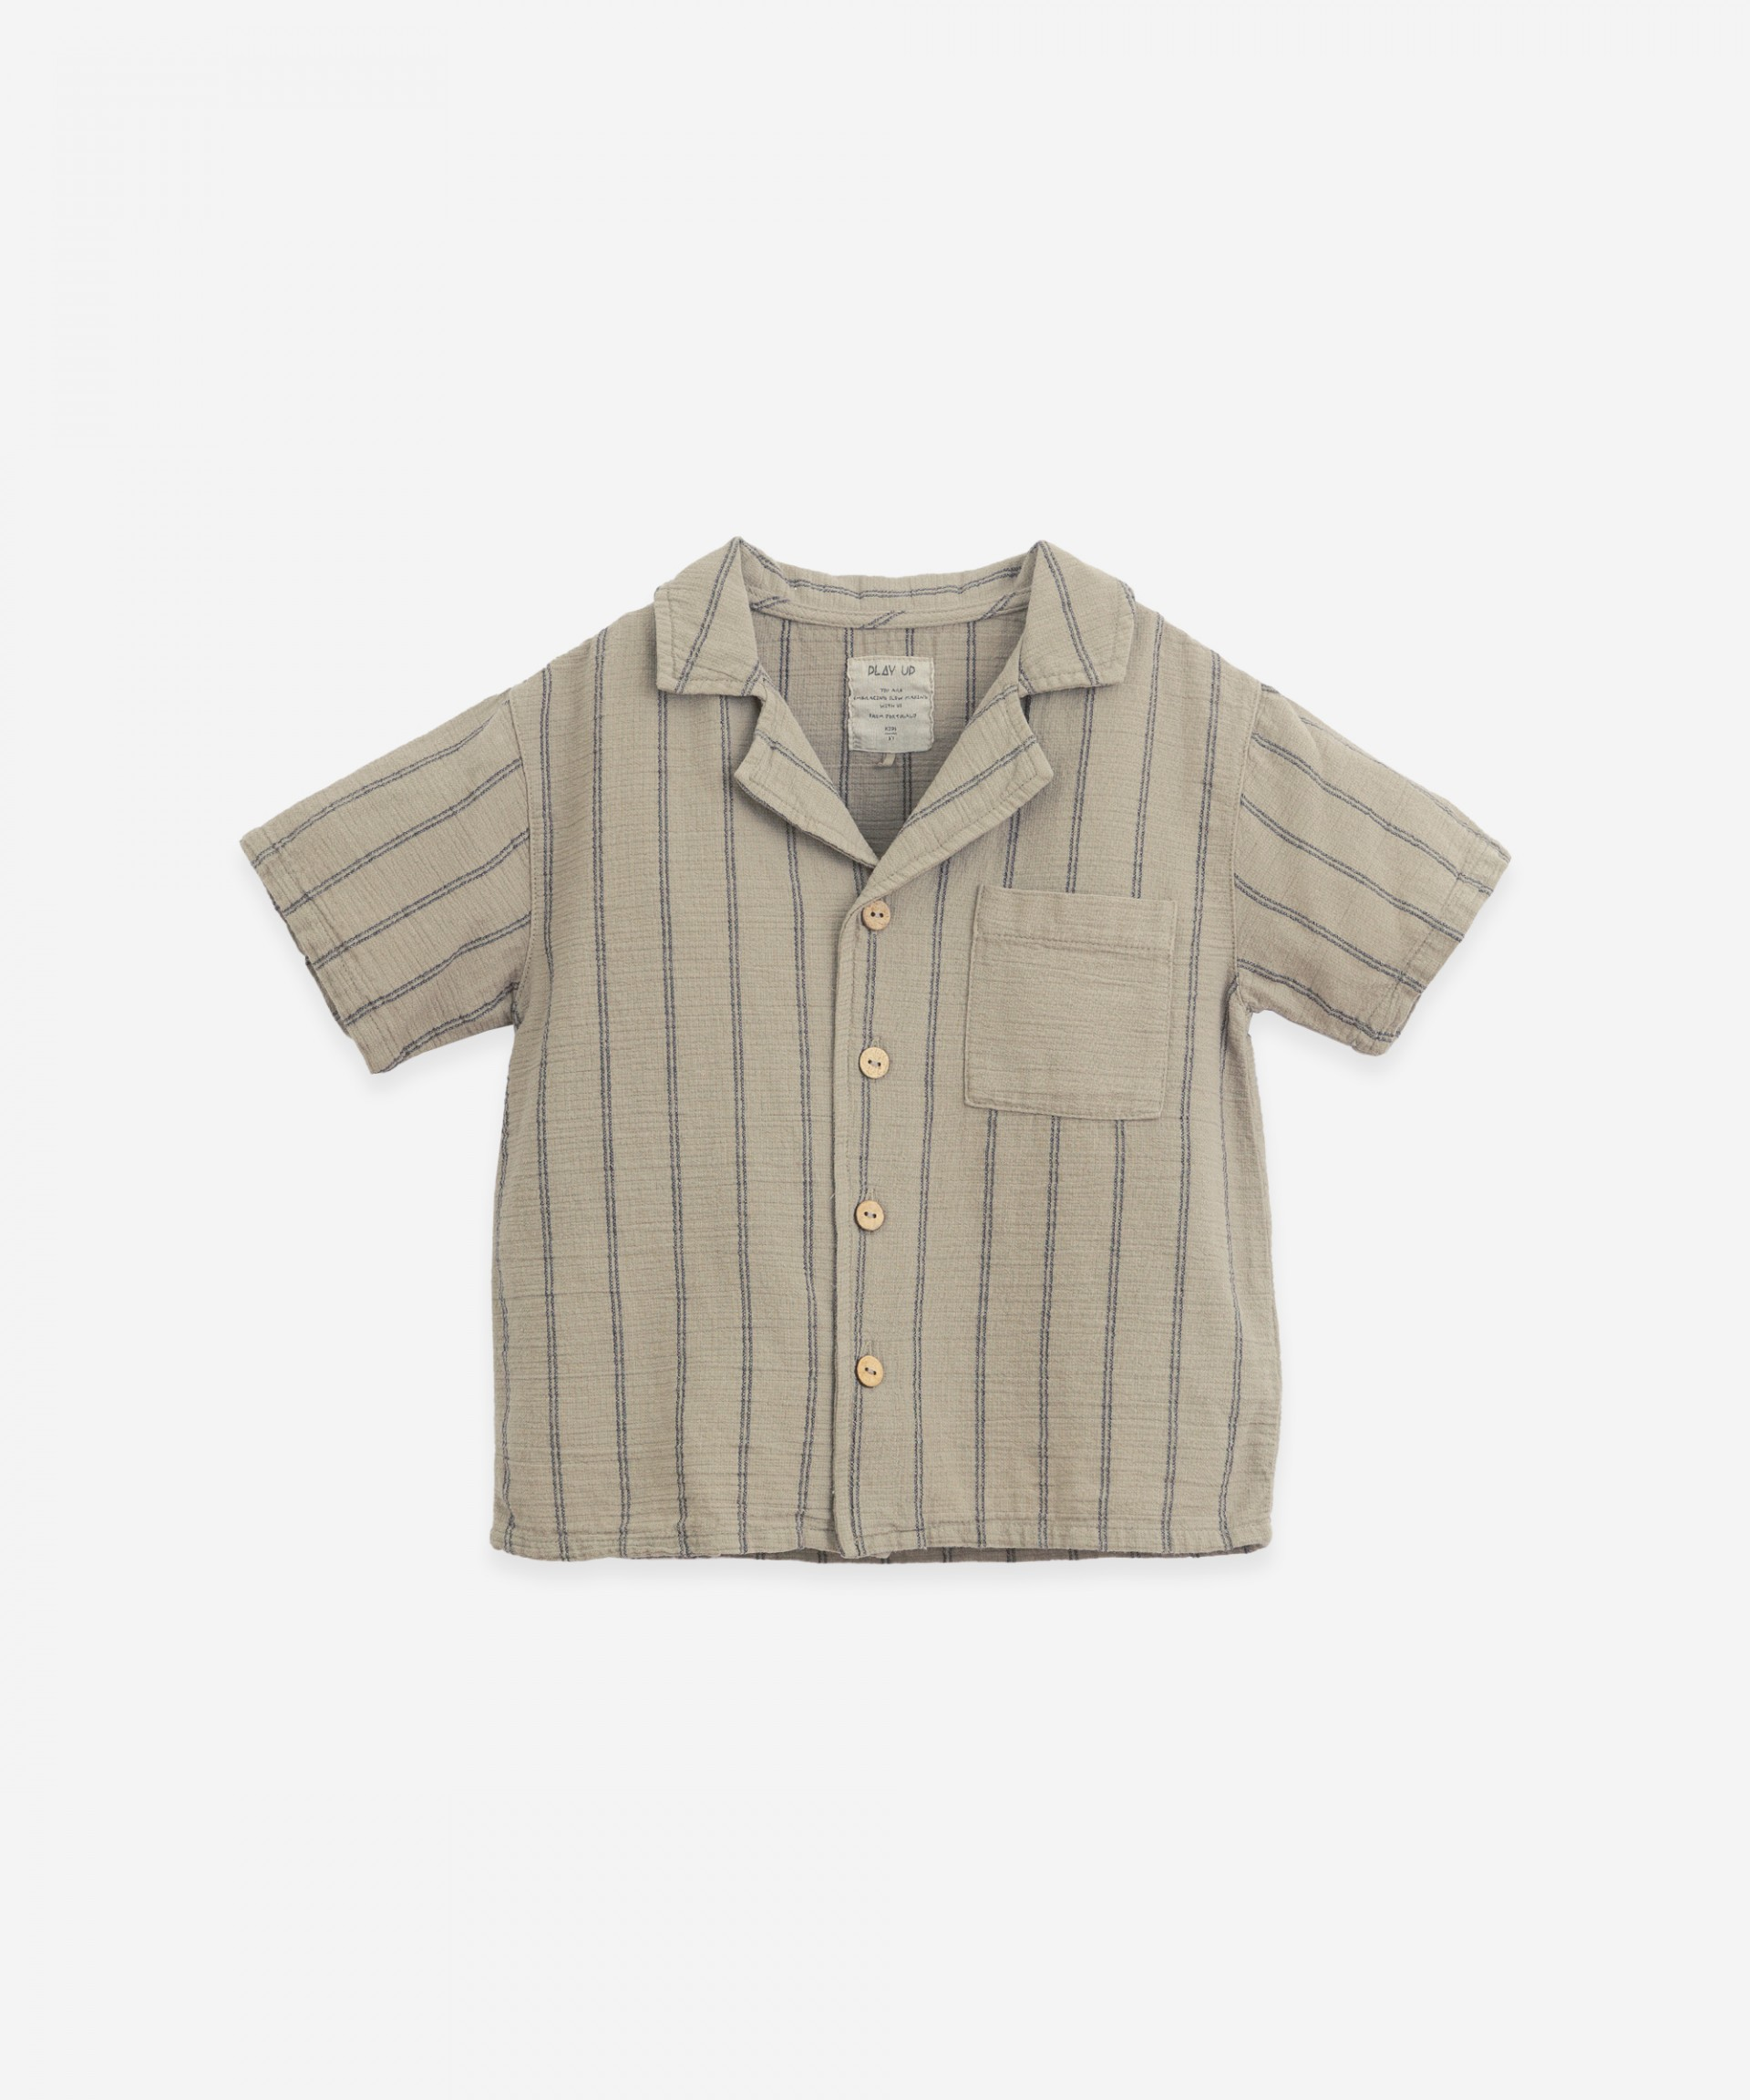 Striped shirt with pocket | Botany